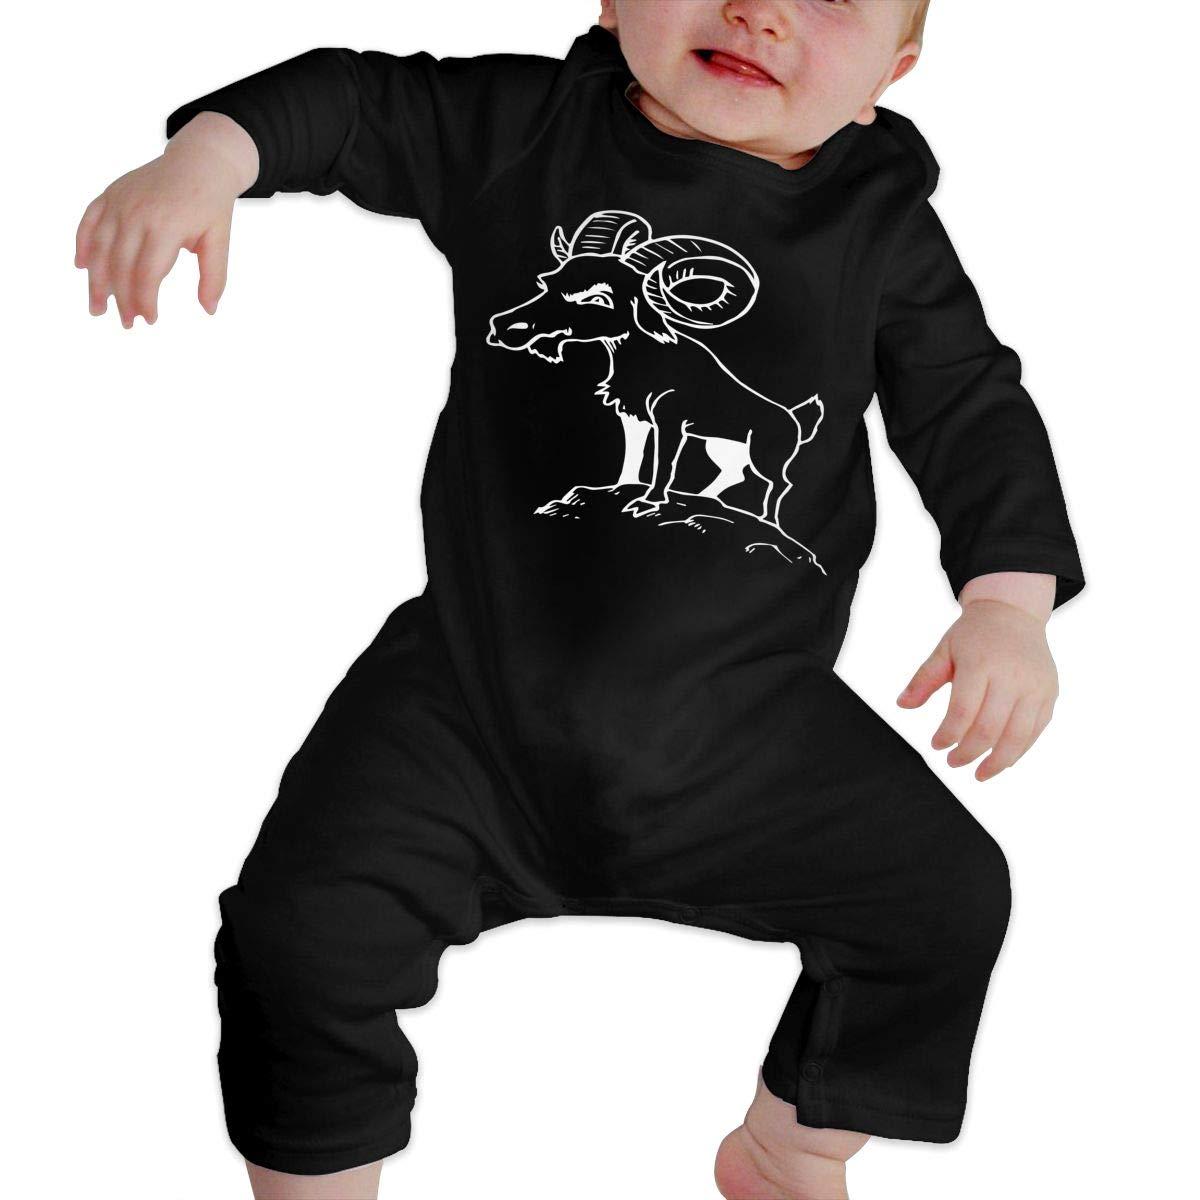 UGFGF-S3 Billy Goat Baby Boy Long Sleeve Bodysuit Infant Romper Jumpsuit Onsies